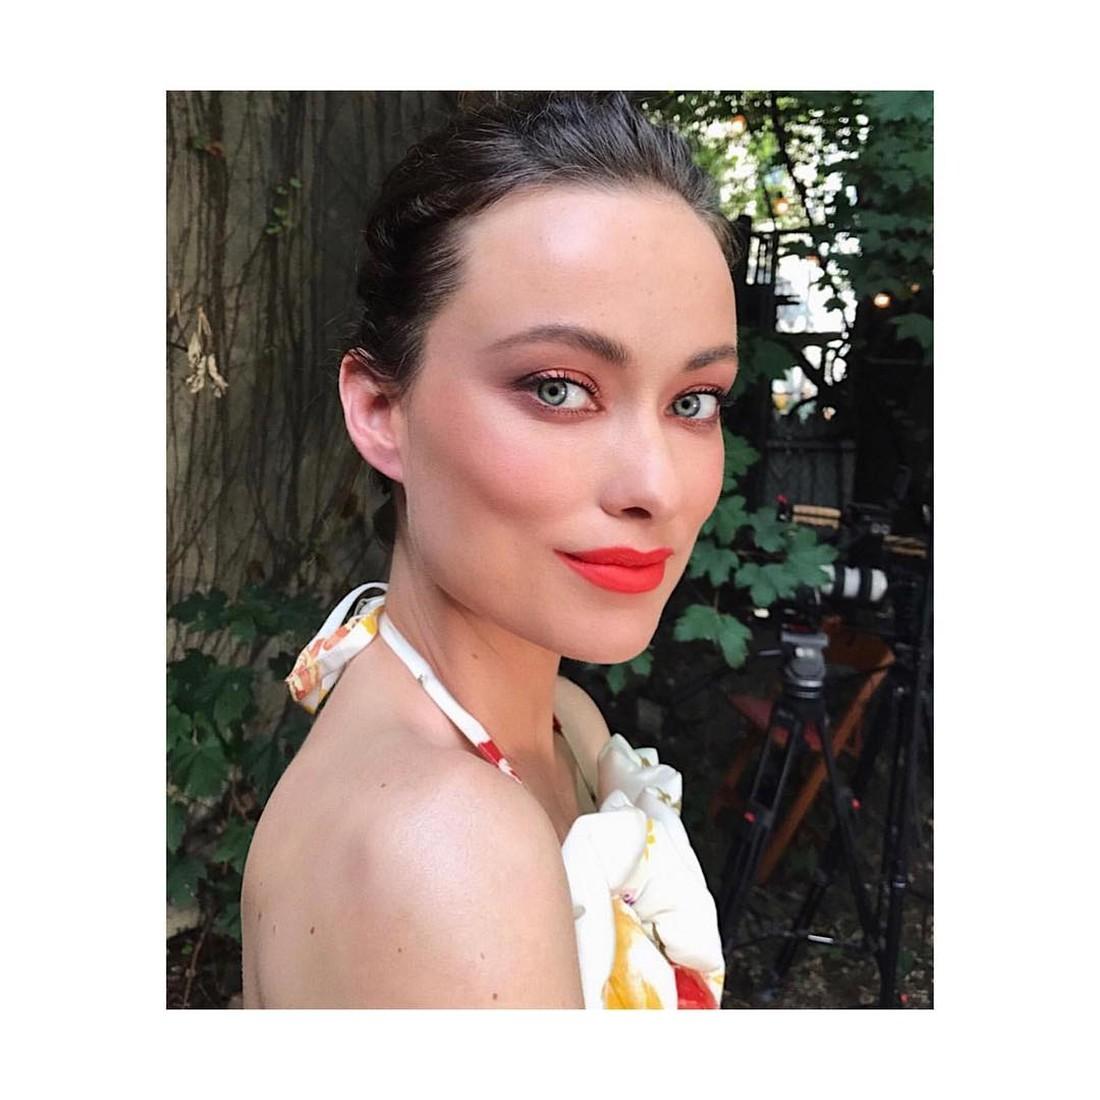 http://i42.woman.ru/images/gallery/d/6/g_d6beef5caf2a0c3f394a04ba316d4842_2_1400x1100.jpg?02